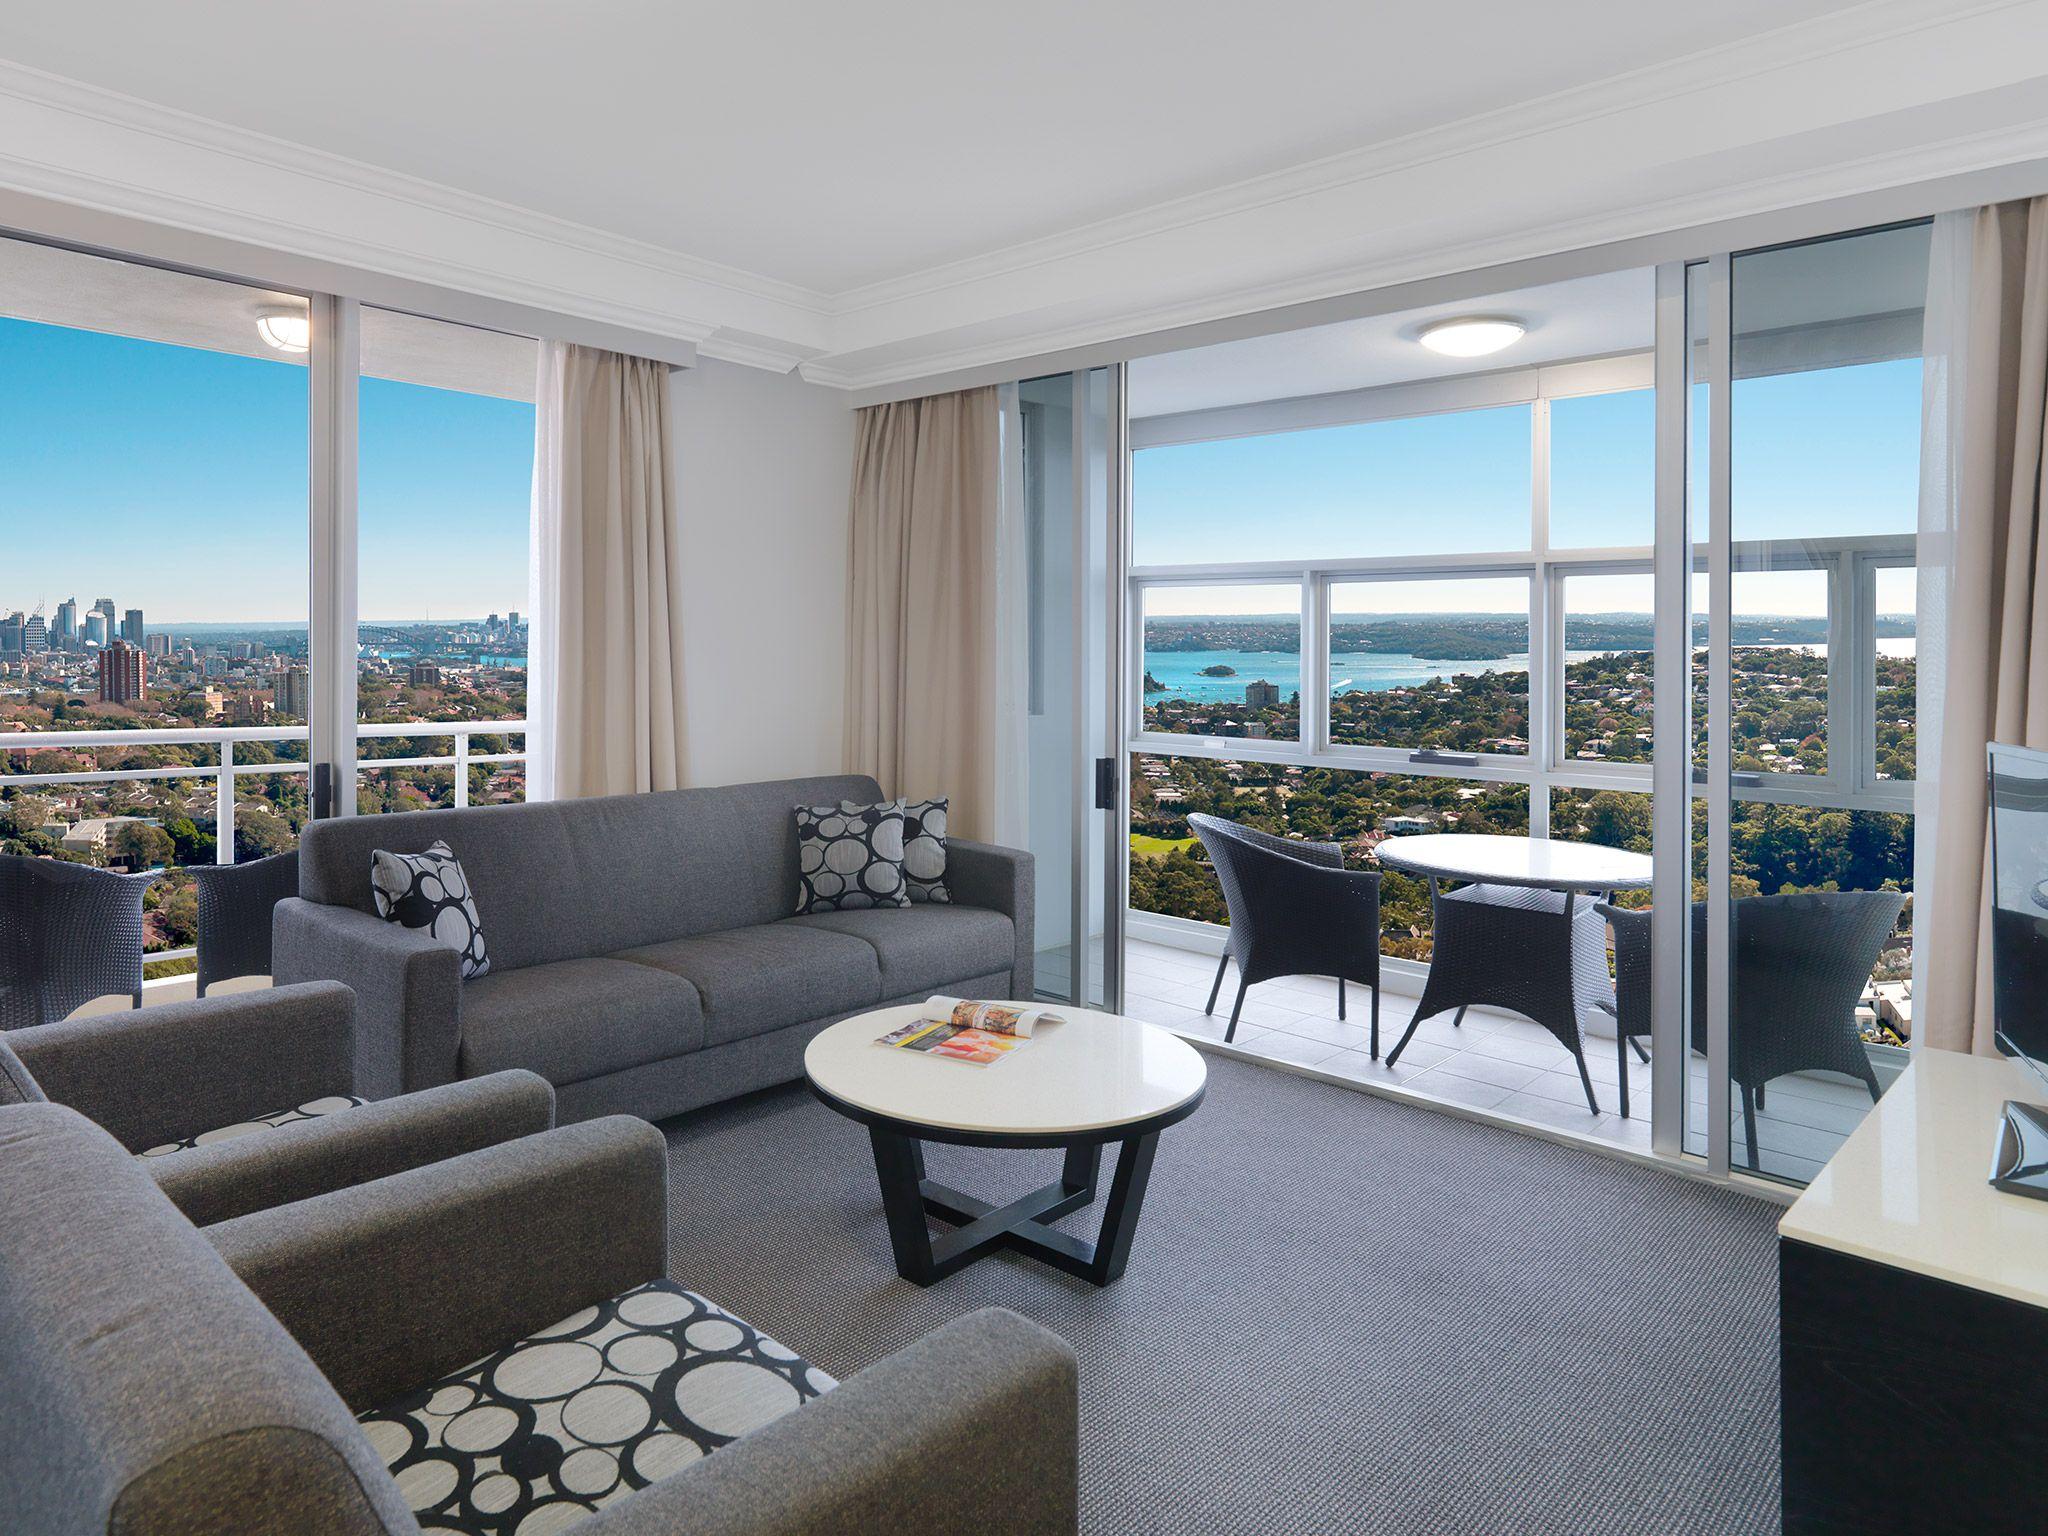 Harbour Suite With 3 Bedrooms Sydney Bondijunction Luxury Hotels Meriton Sydney Hotel Serviced Apartments Hotel